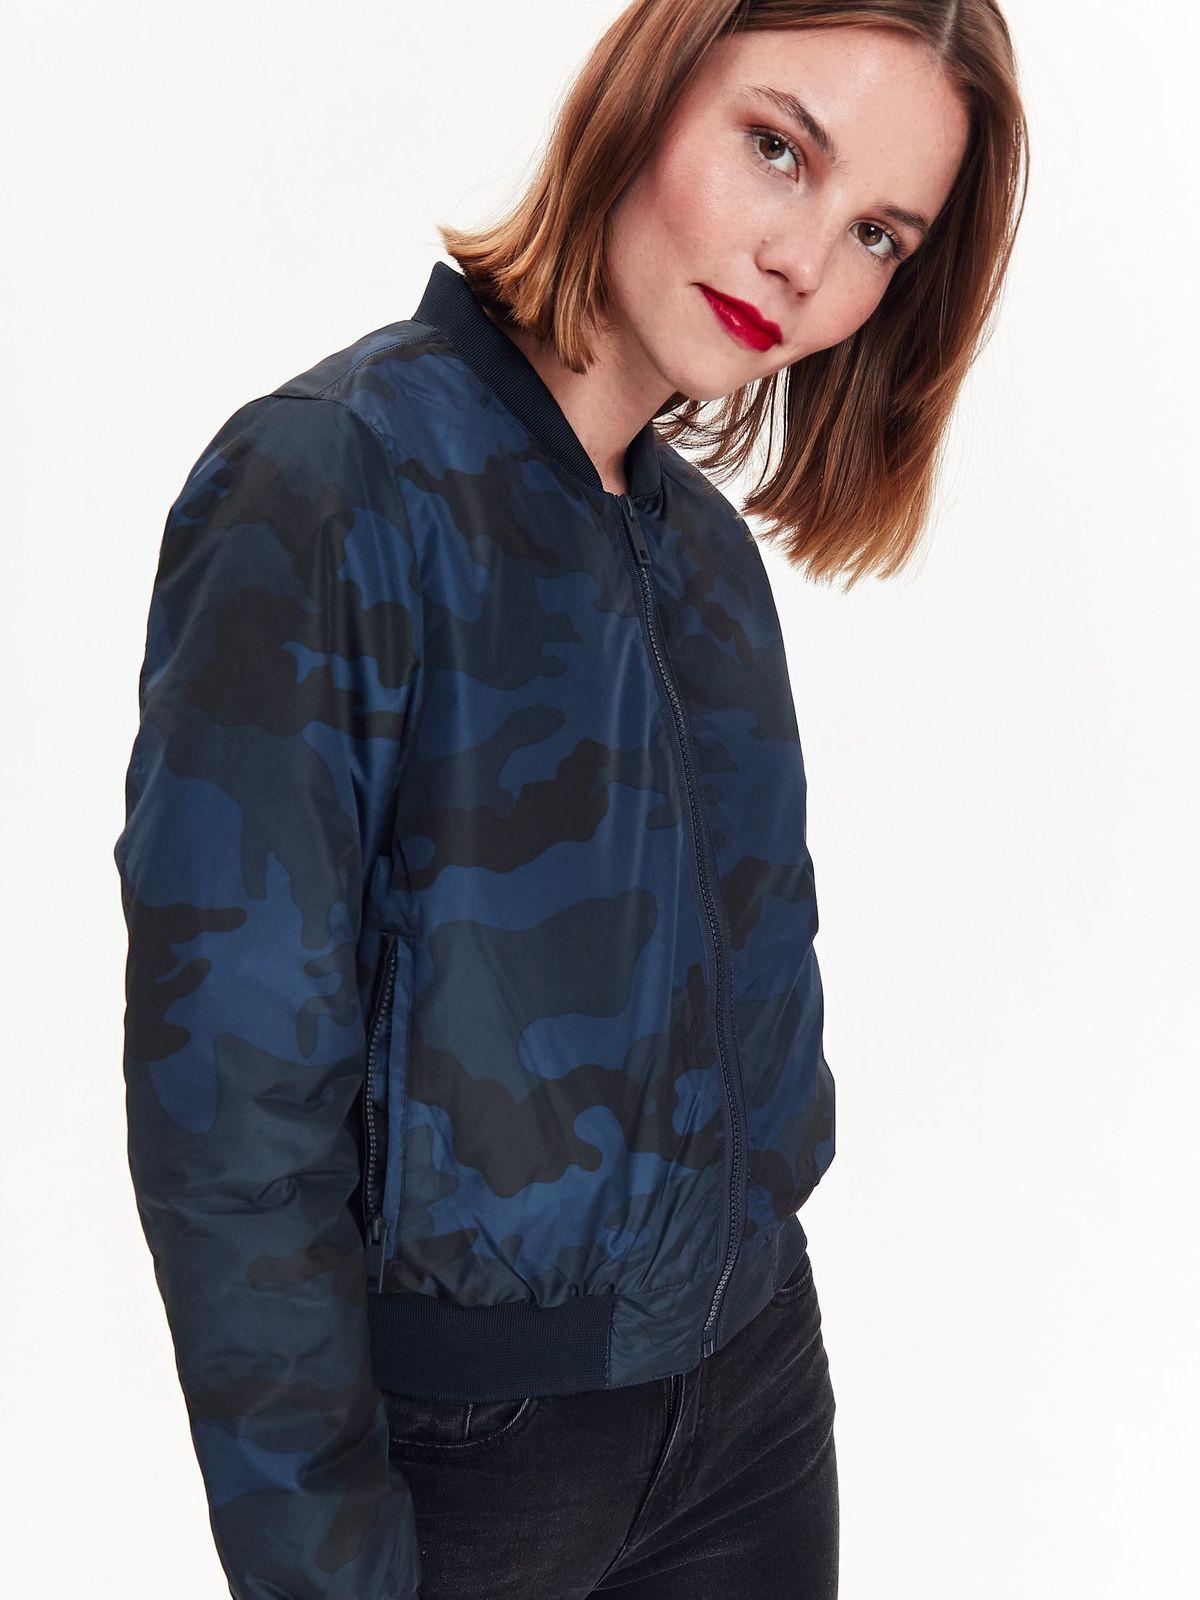 TOP SECRET TOP SECRET camo bomber jacket